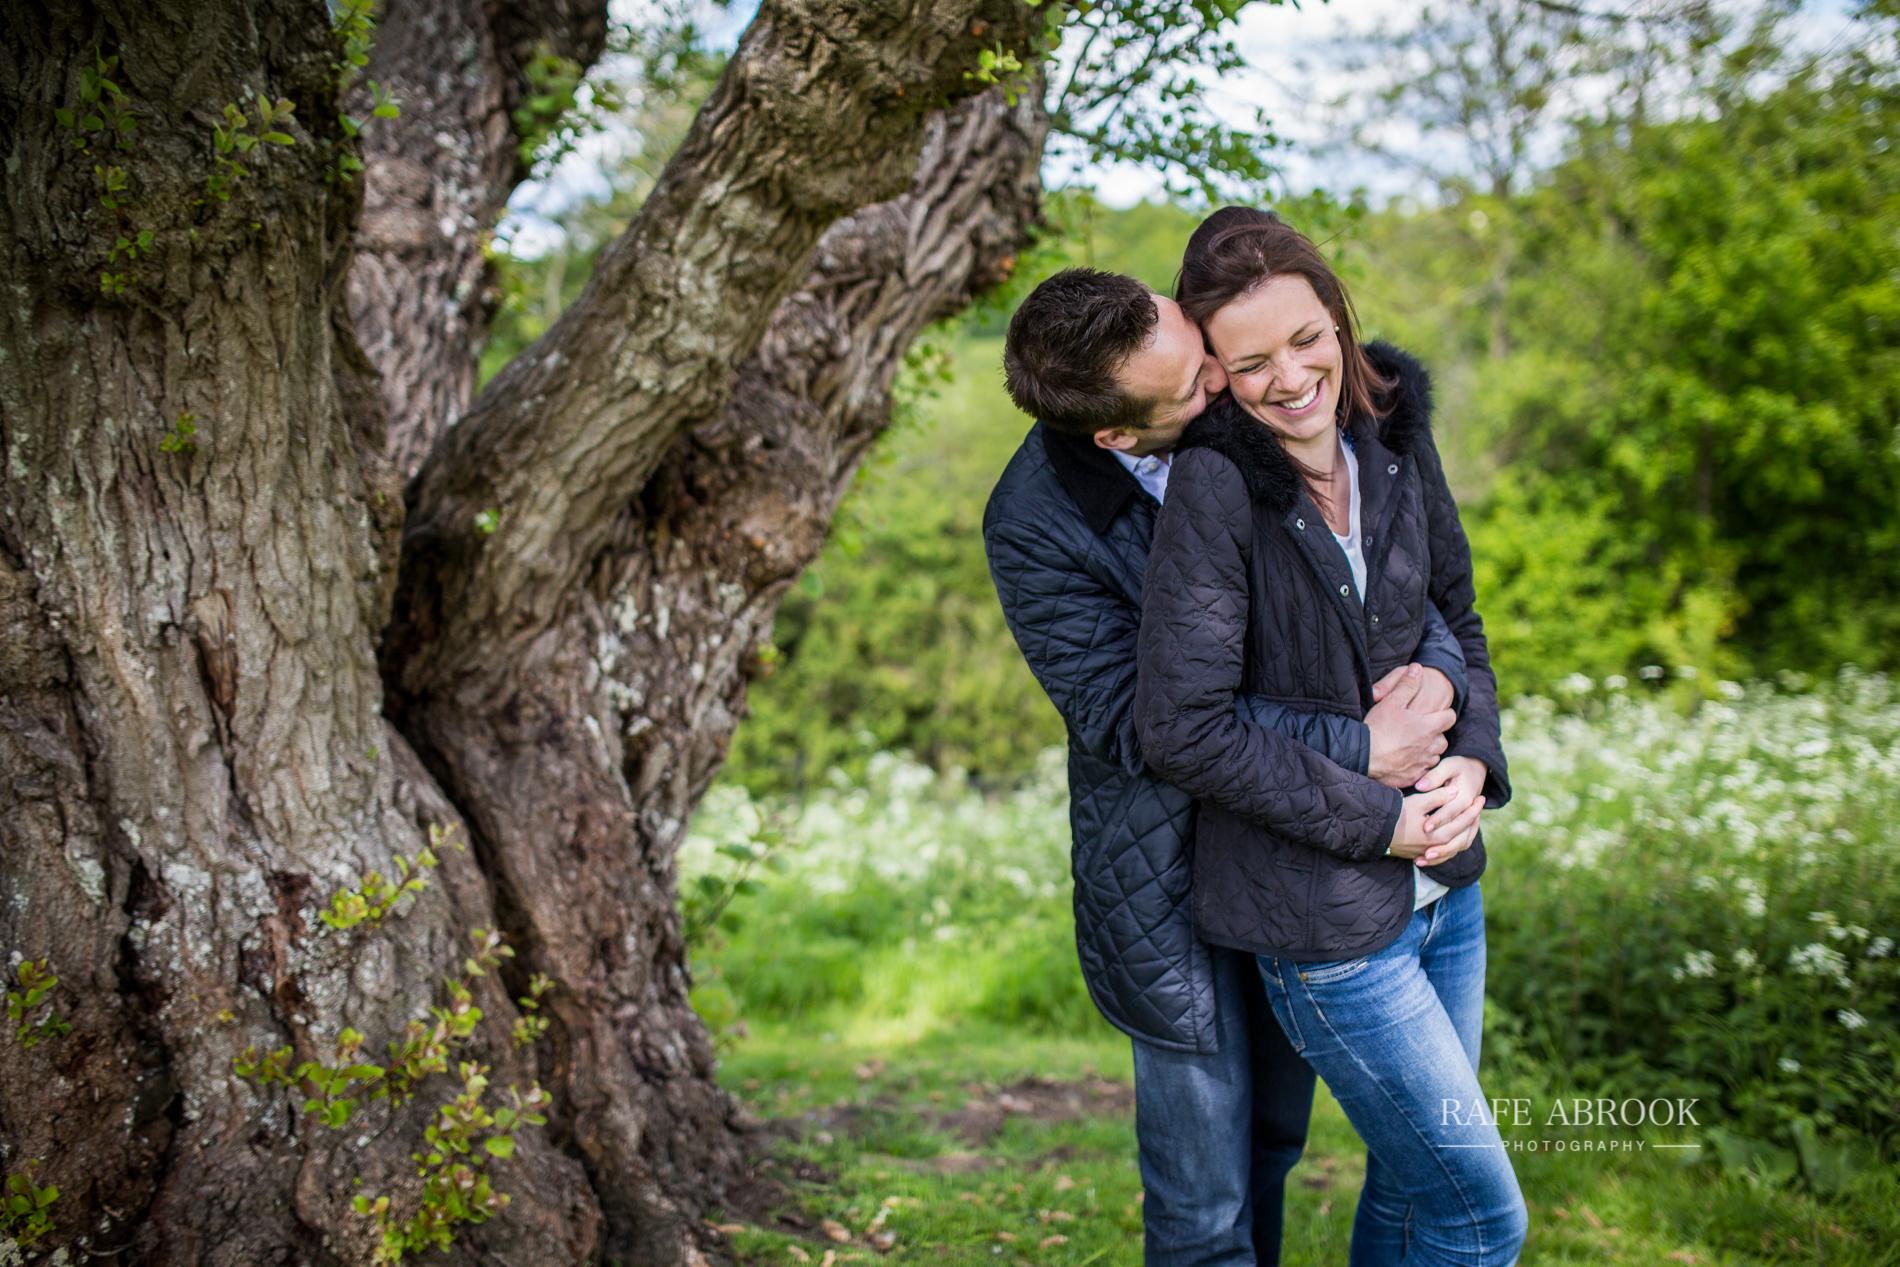 andy & eloise engagement shoot donnington castle berkshire-1030.jpg